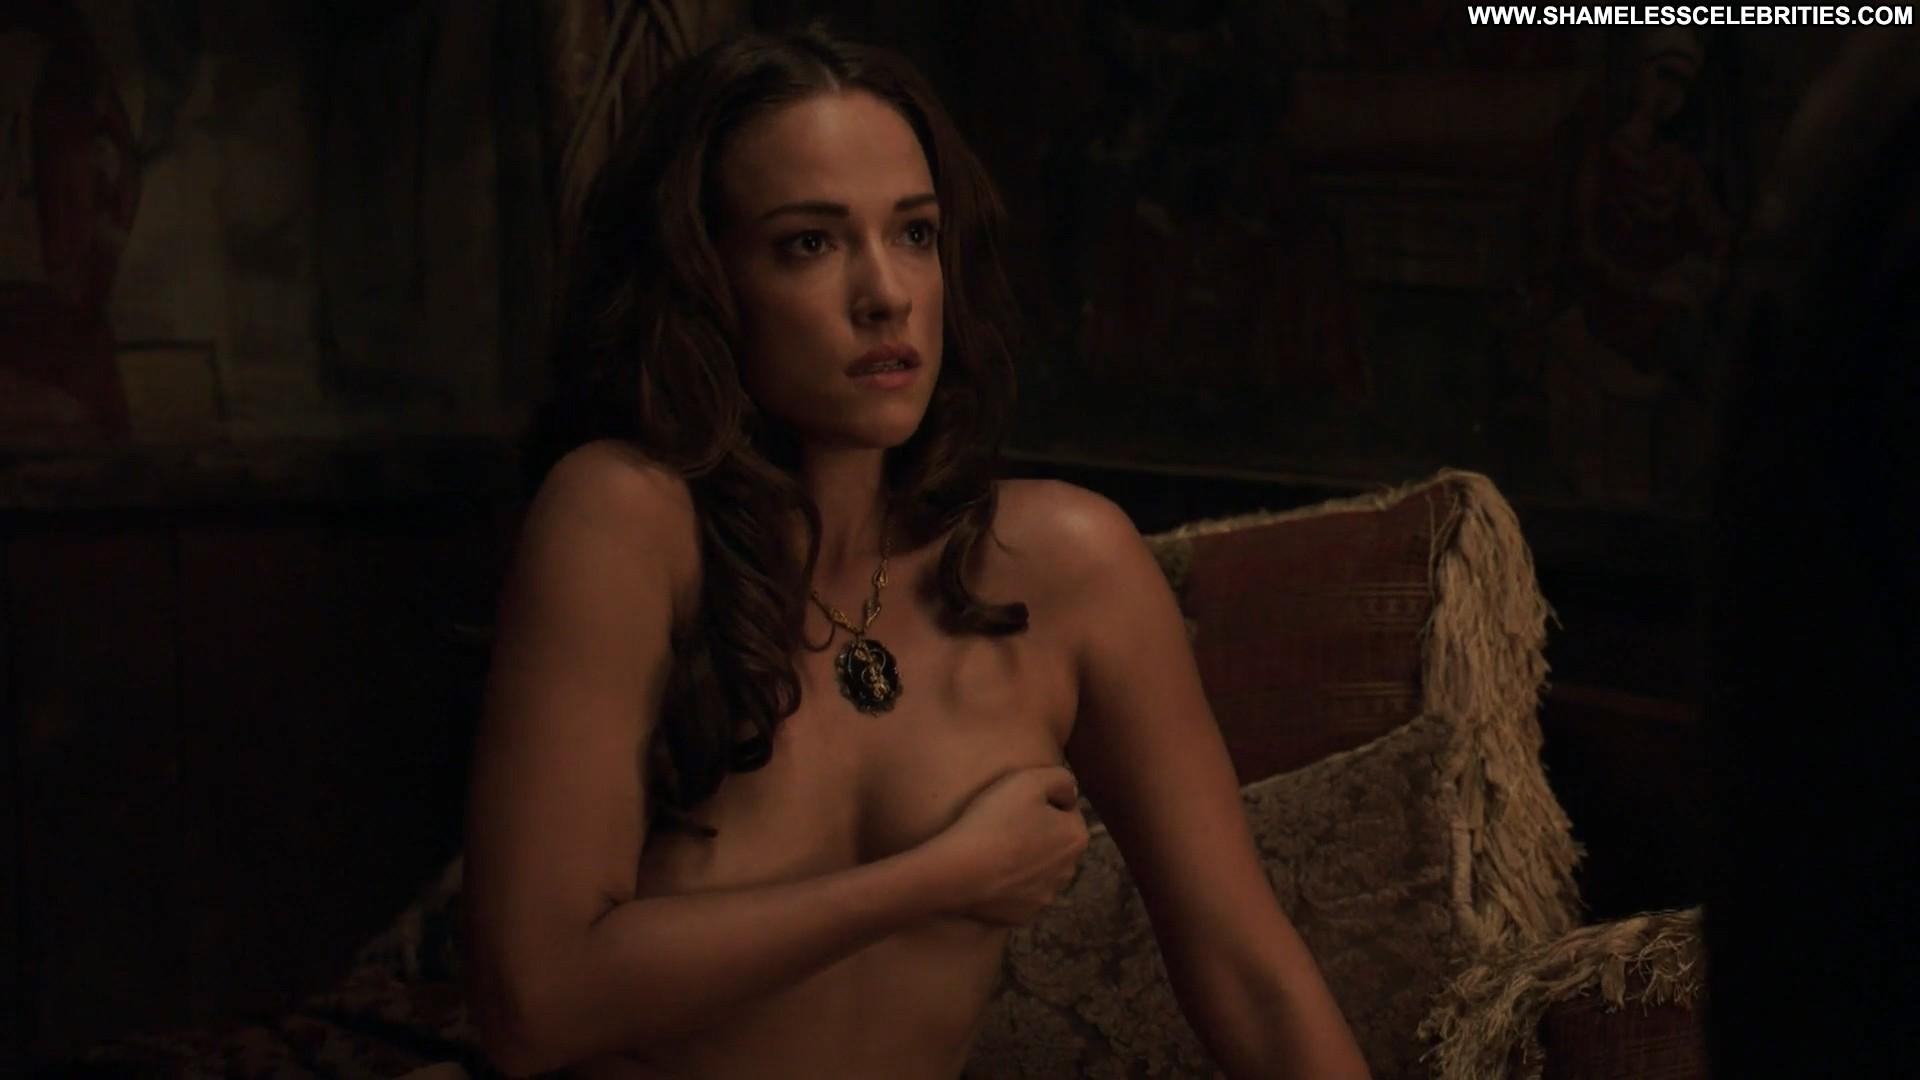 israeli beauty girl sex video